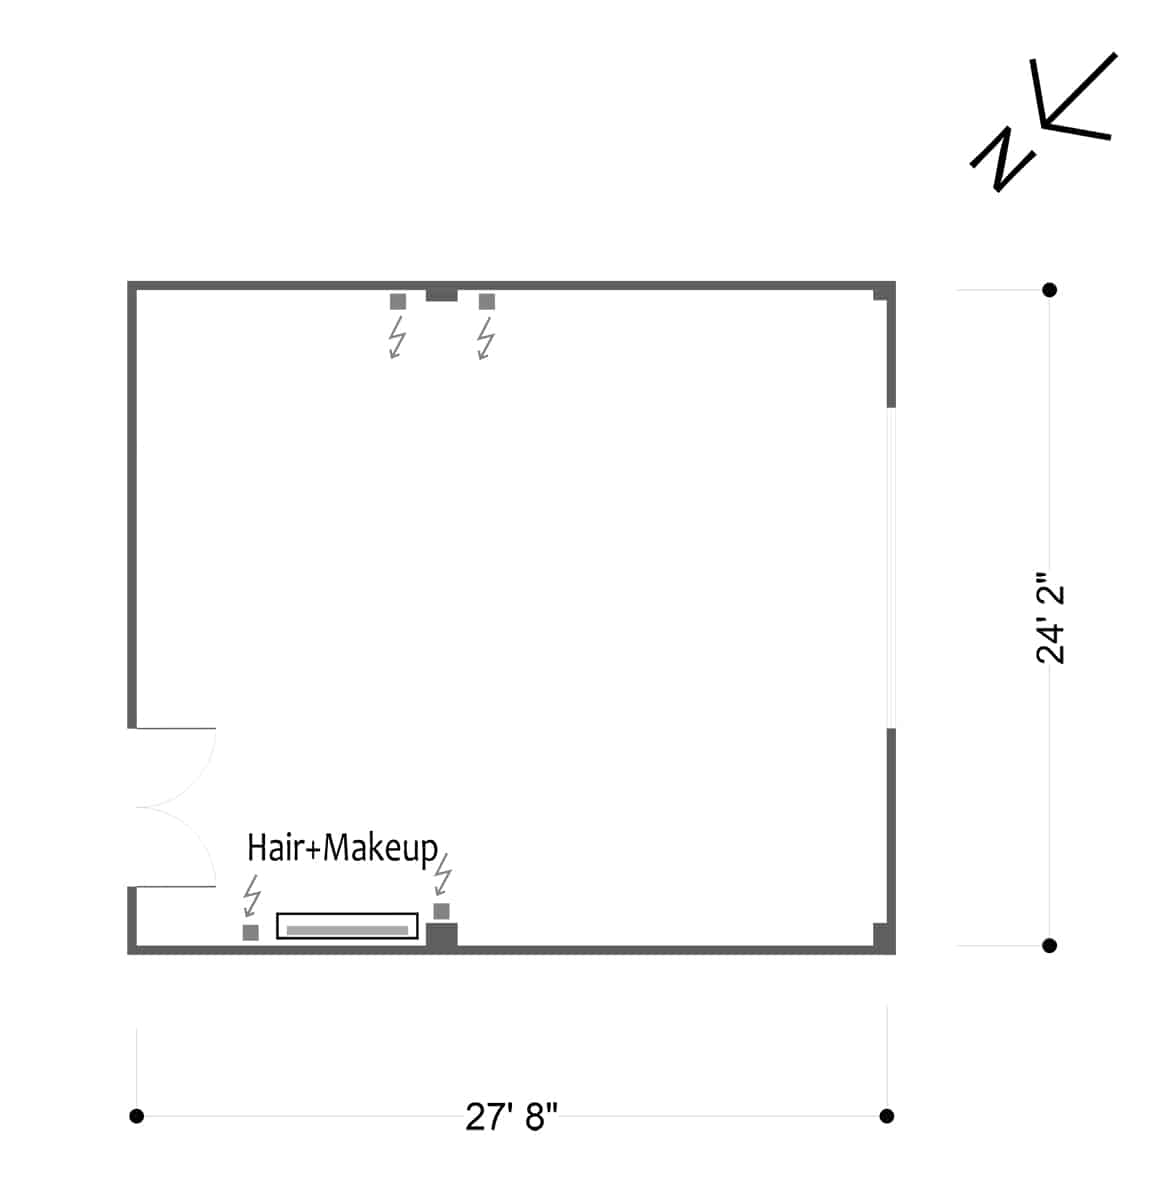 FD Studios - Hill 5 - Floor plan